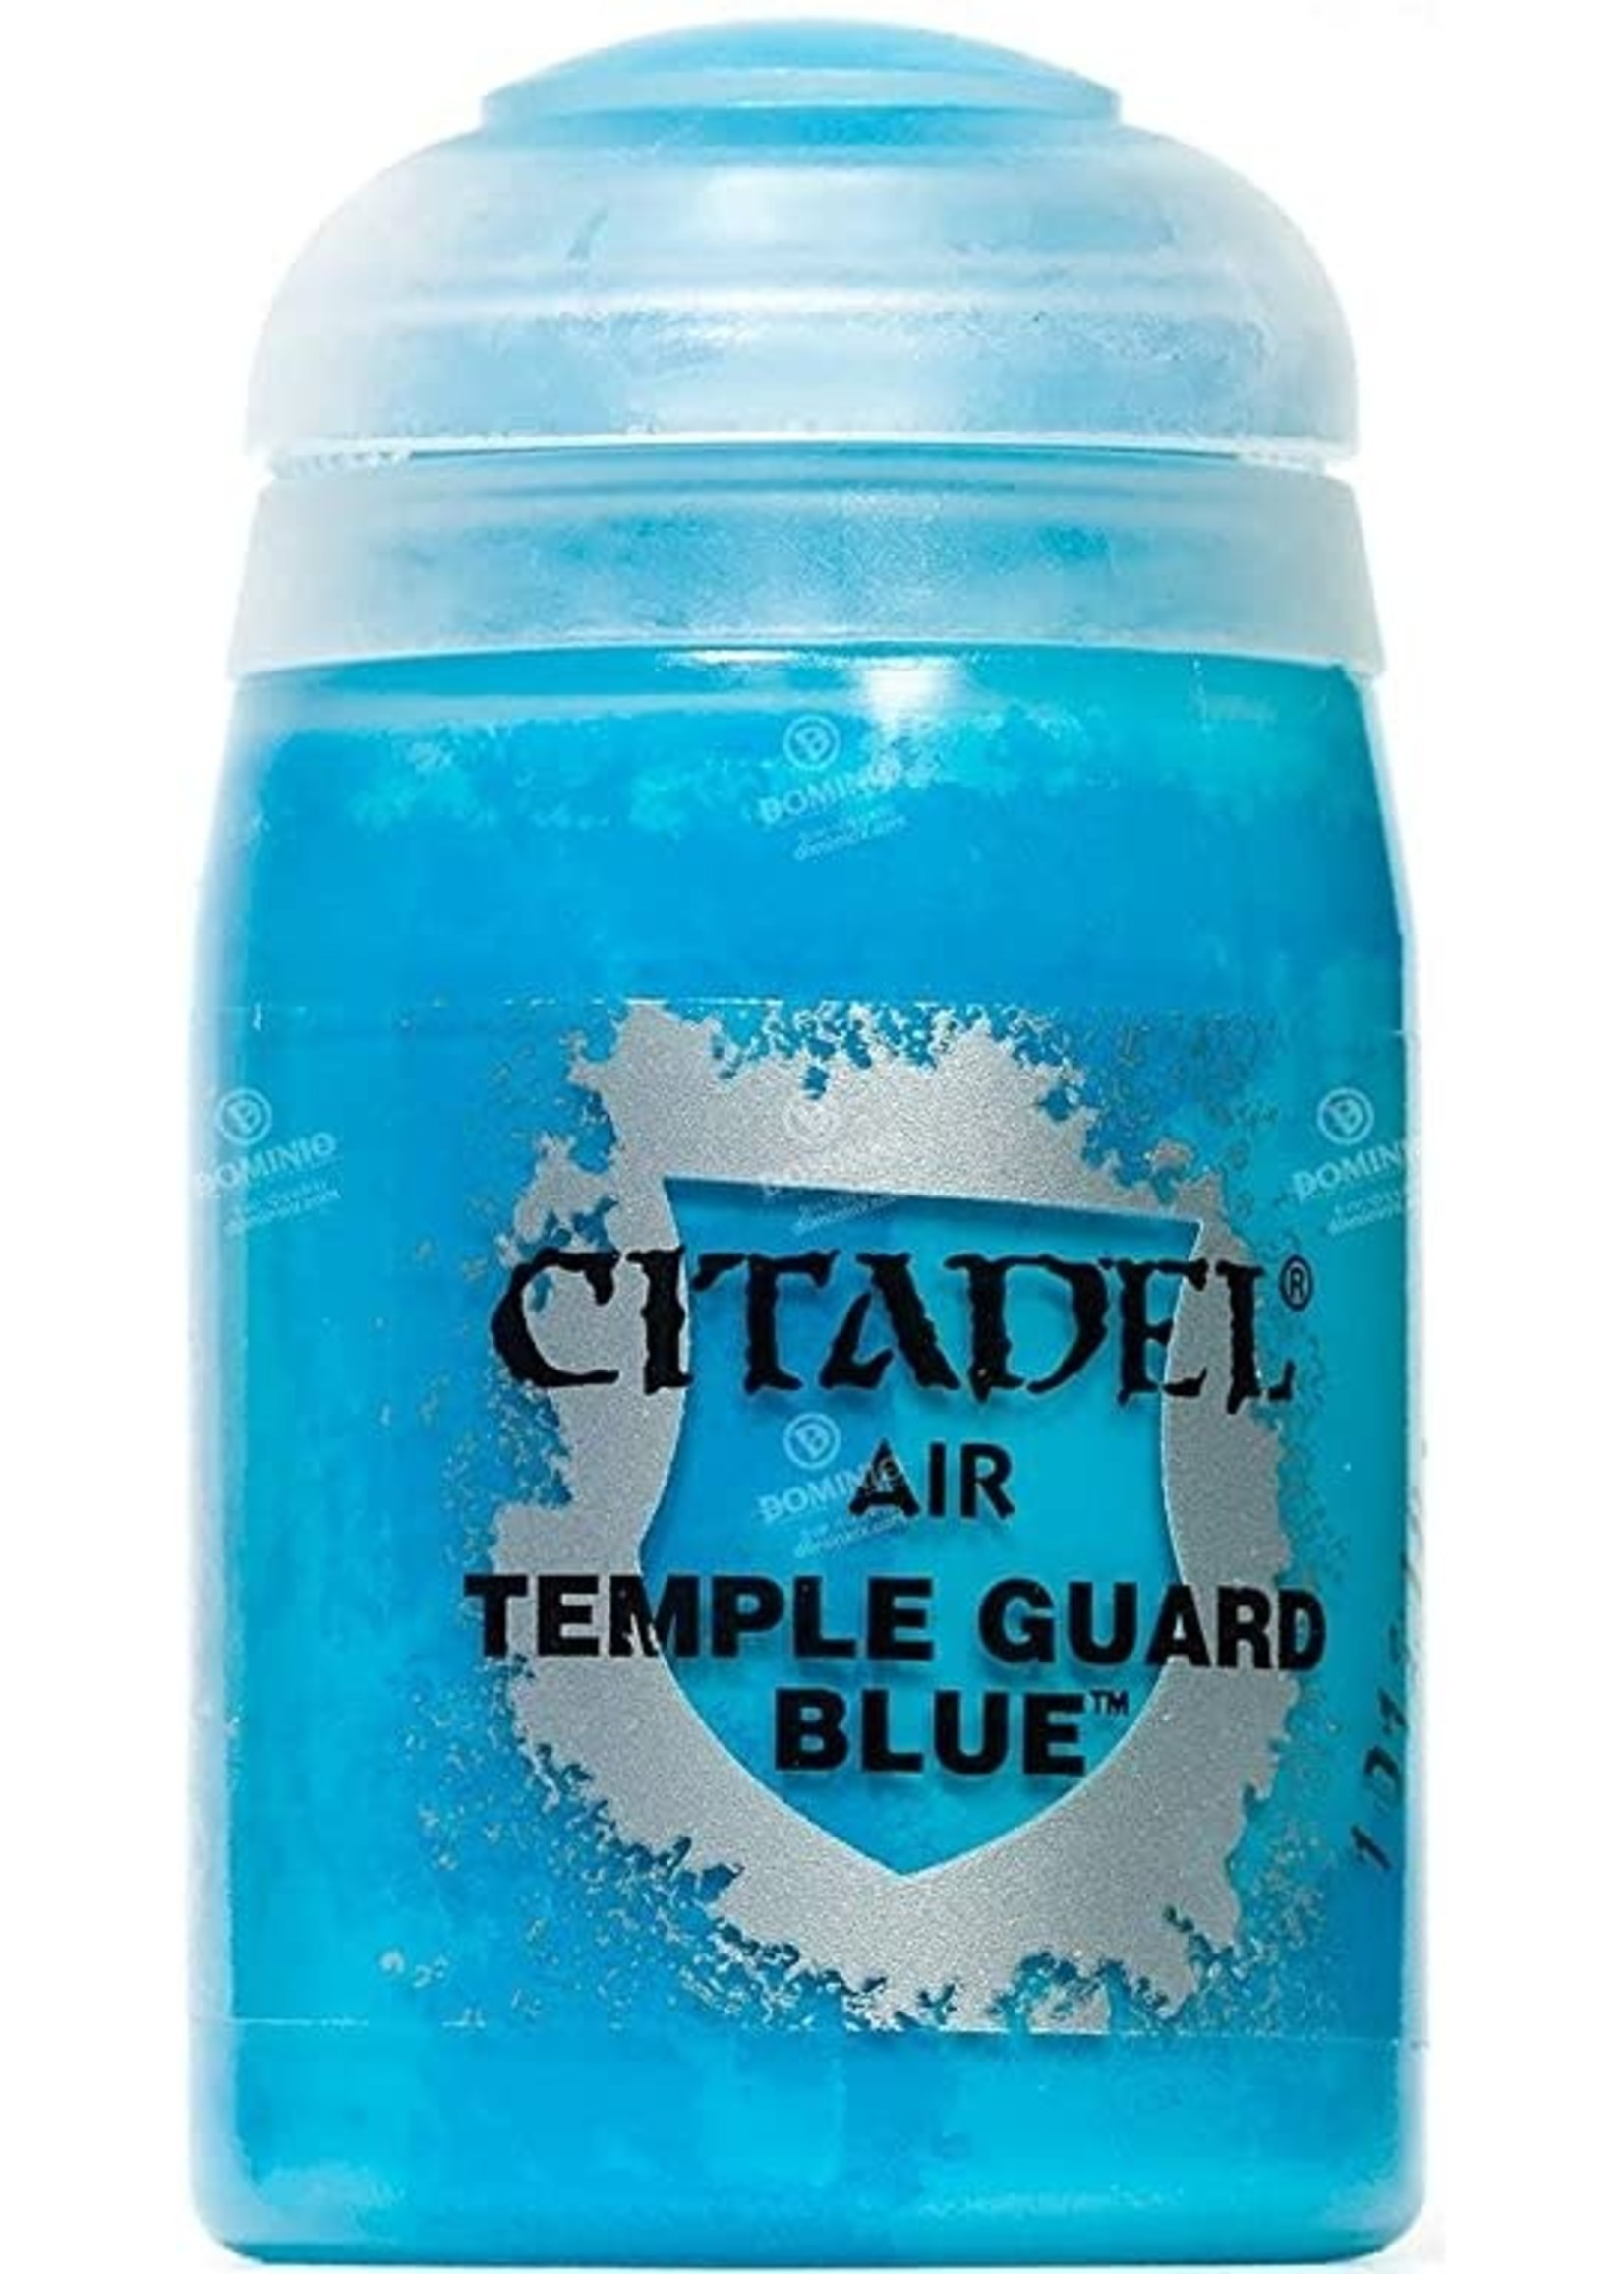 Games Workshop Citadel Paint: Temple Guard Blue Air (24 ml)